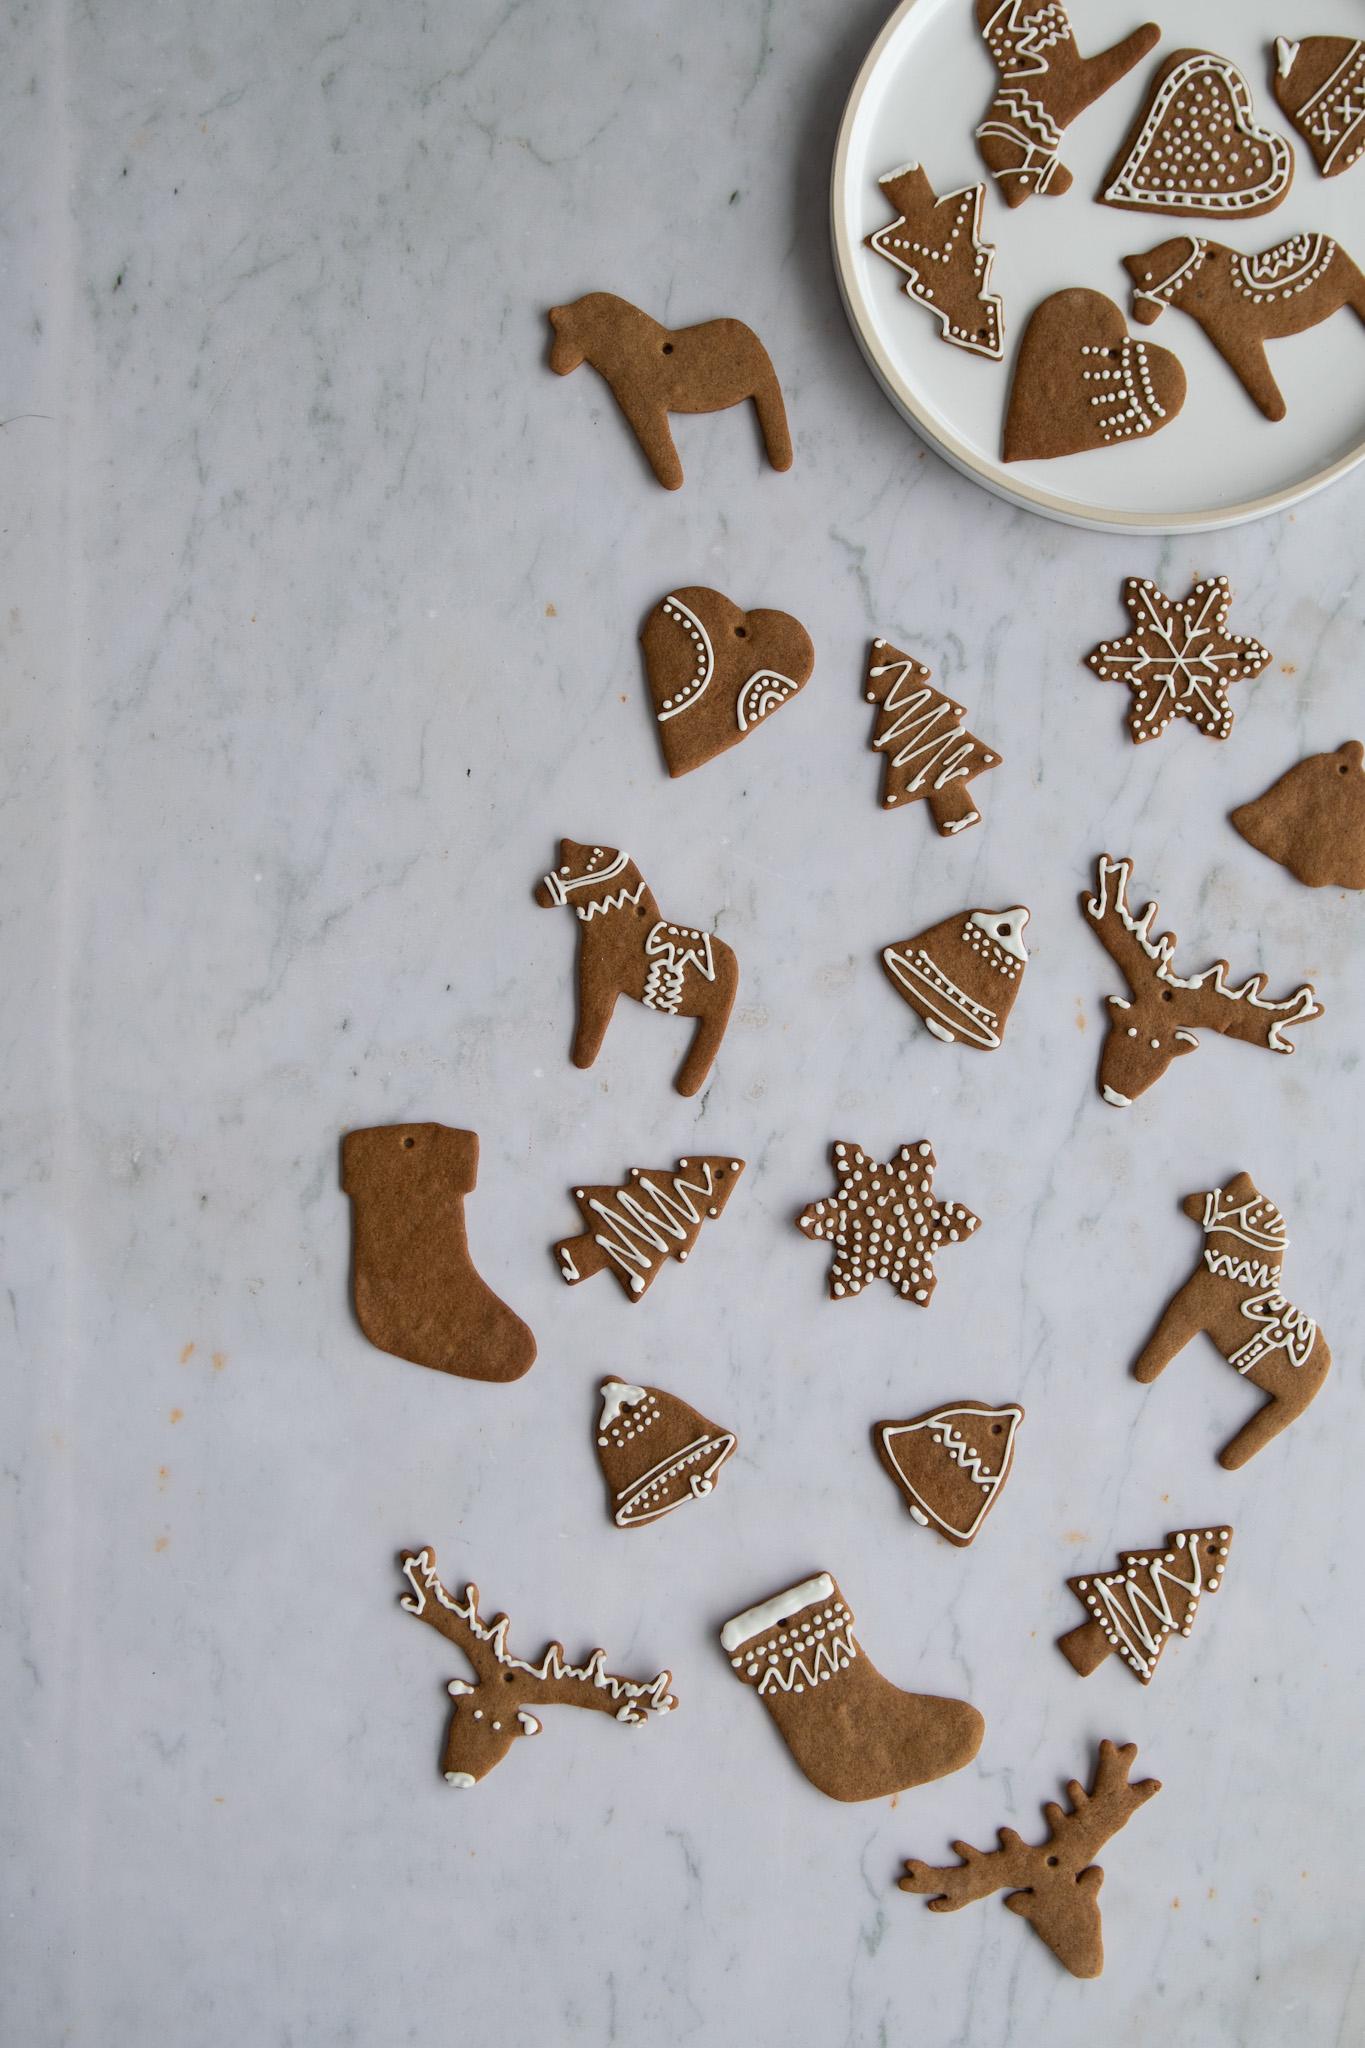 Swedish ginger thins